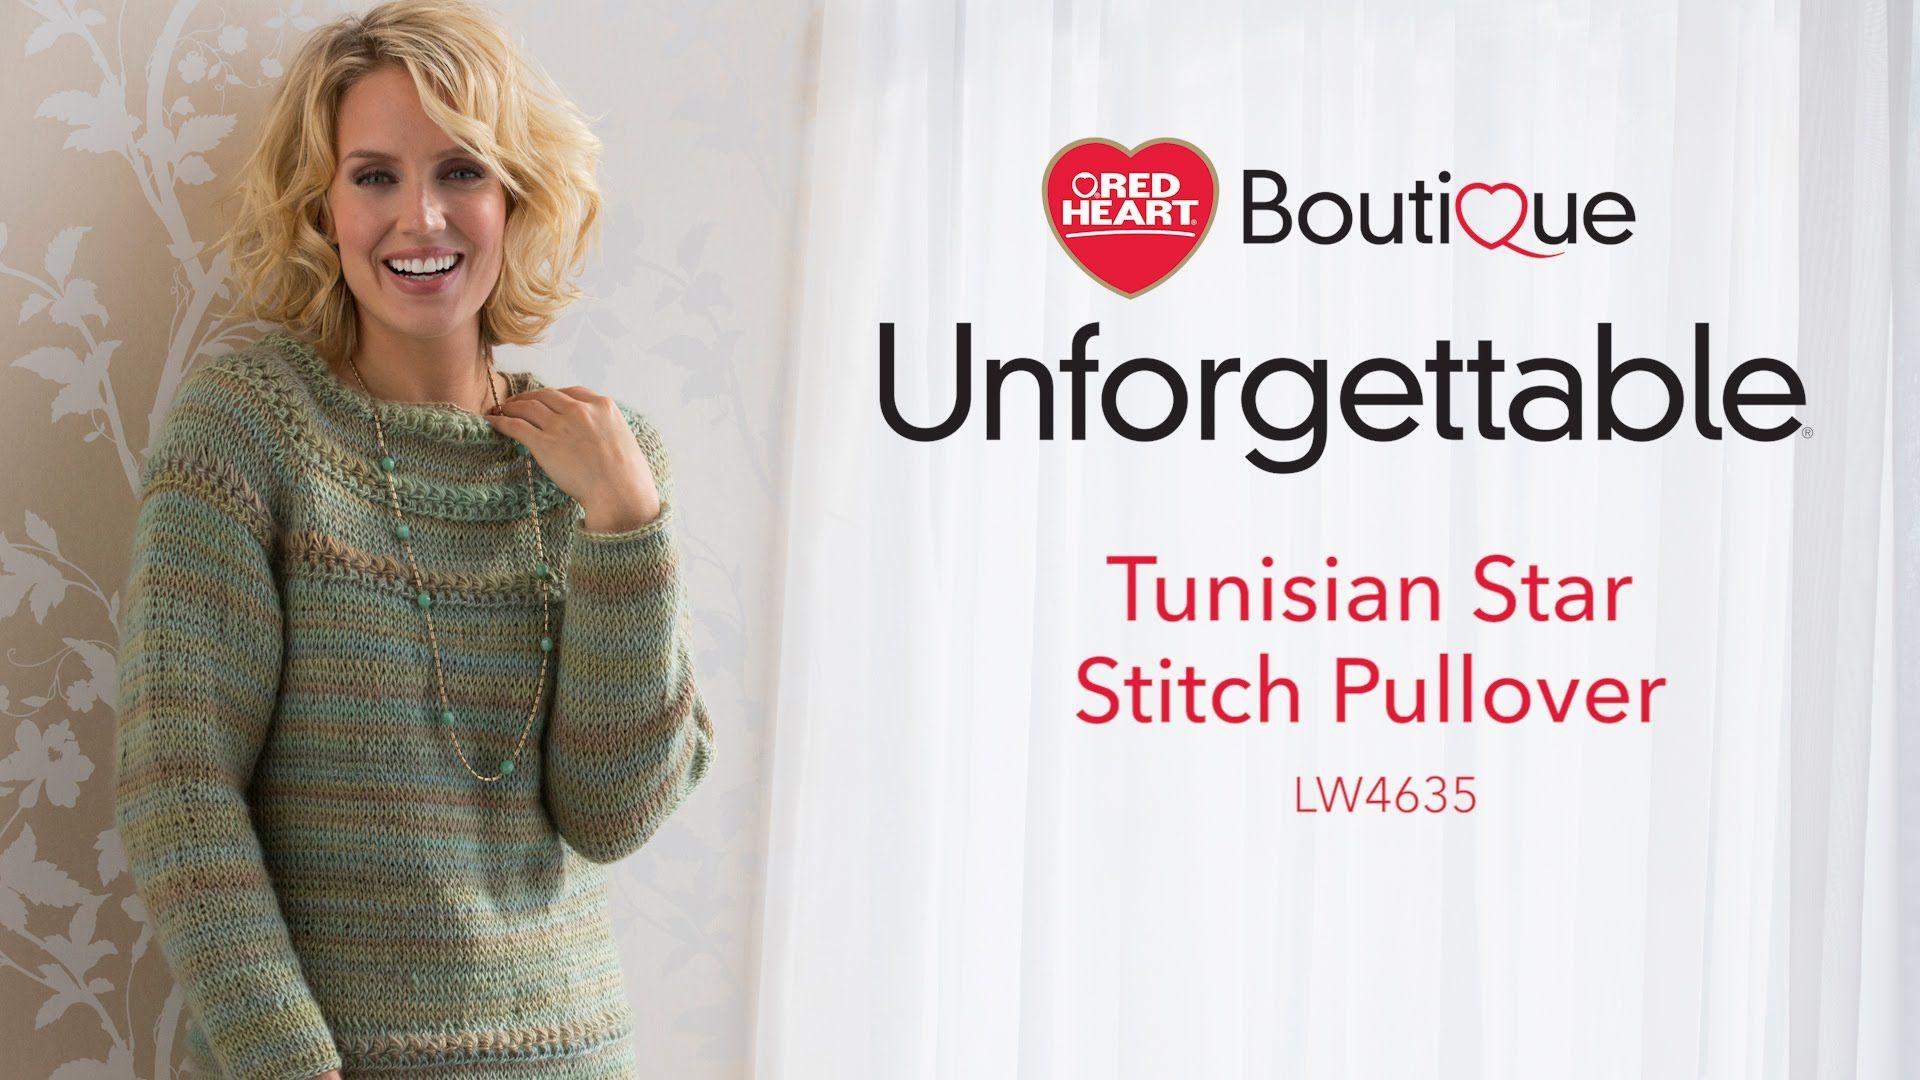 Tunisian Star Stitch Pullover in Red Heart Boutique Unforgettable ...